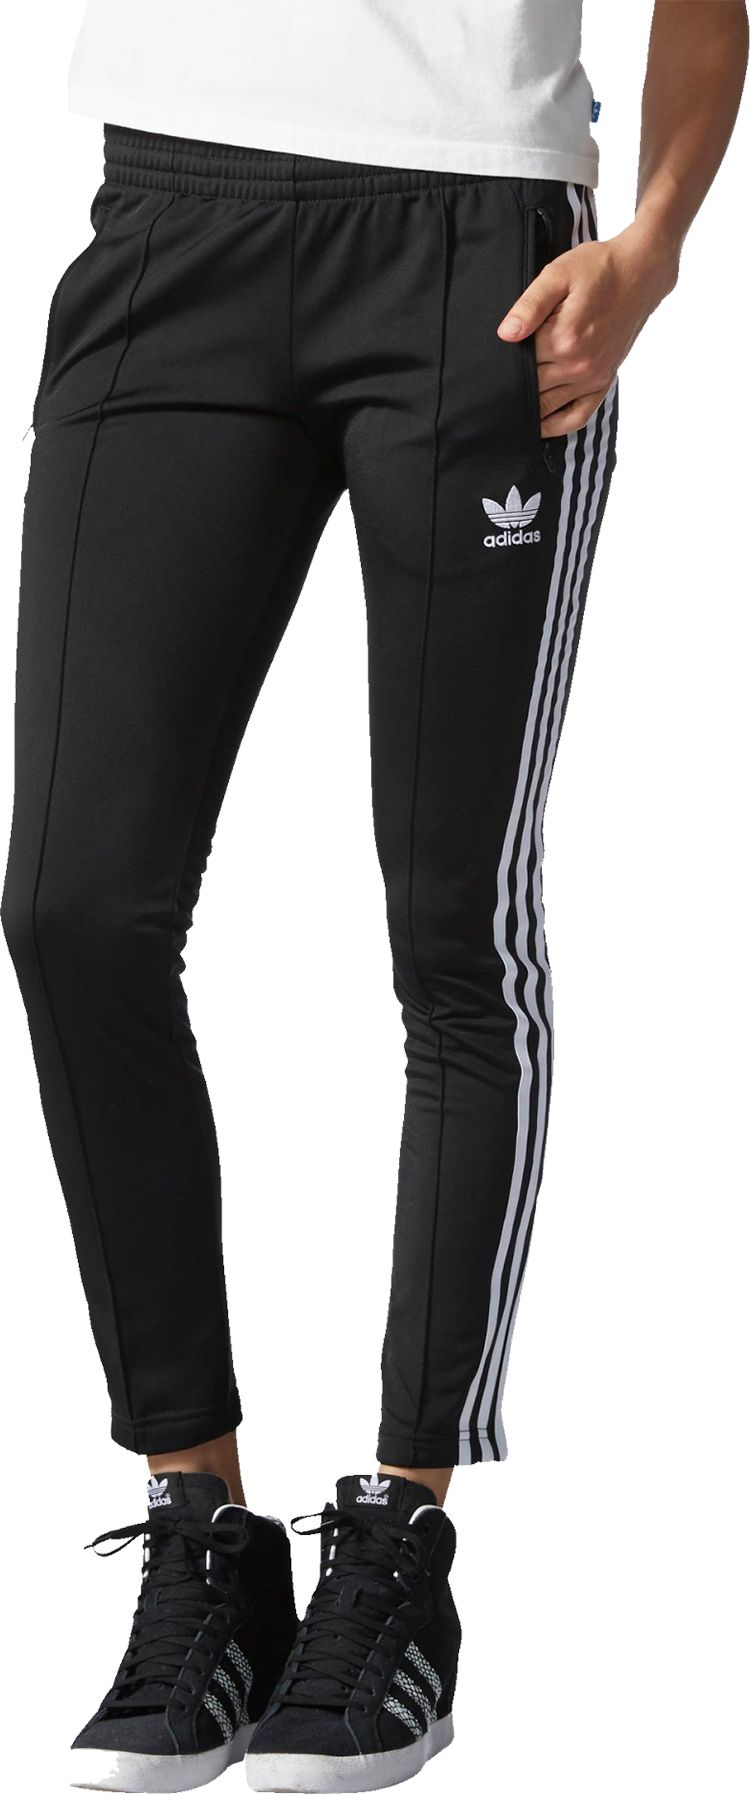 adidas originals pants womens